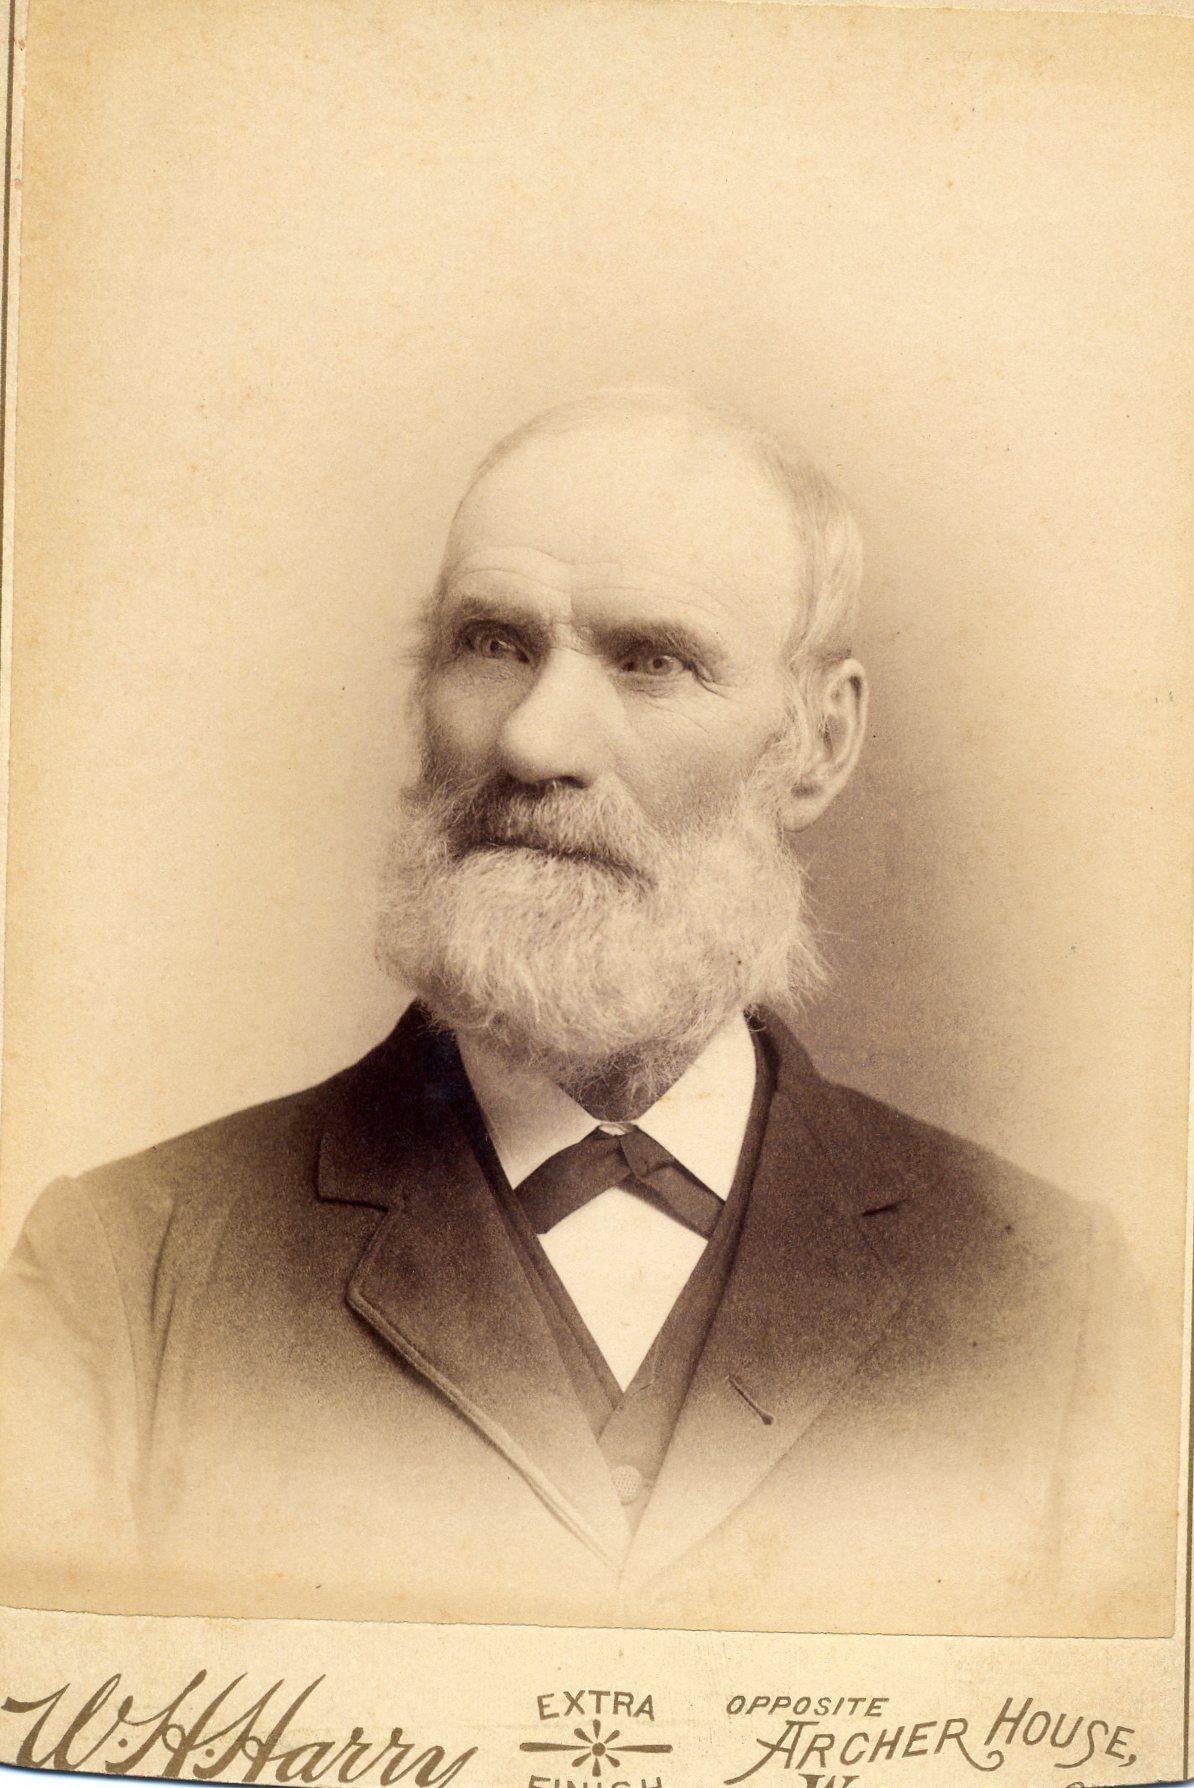 Alexander McCoy